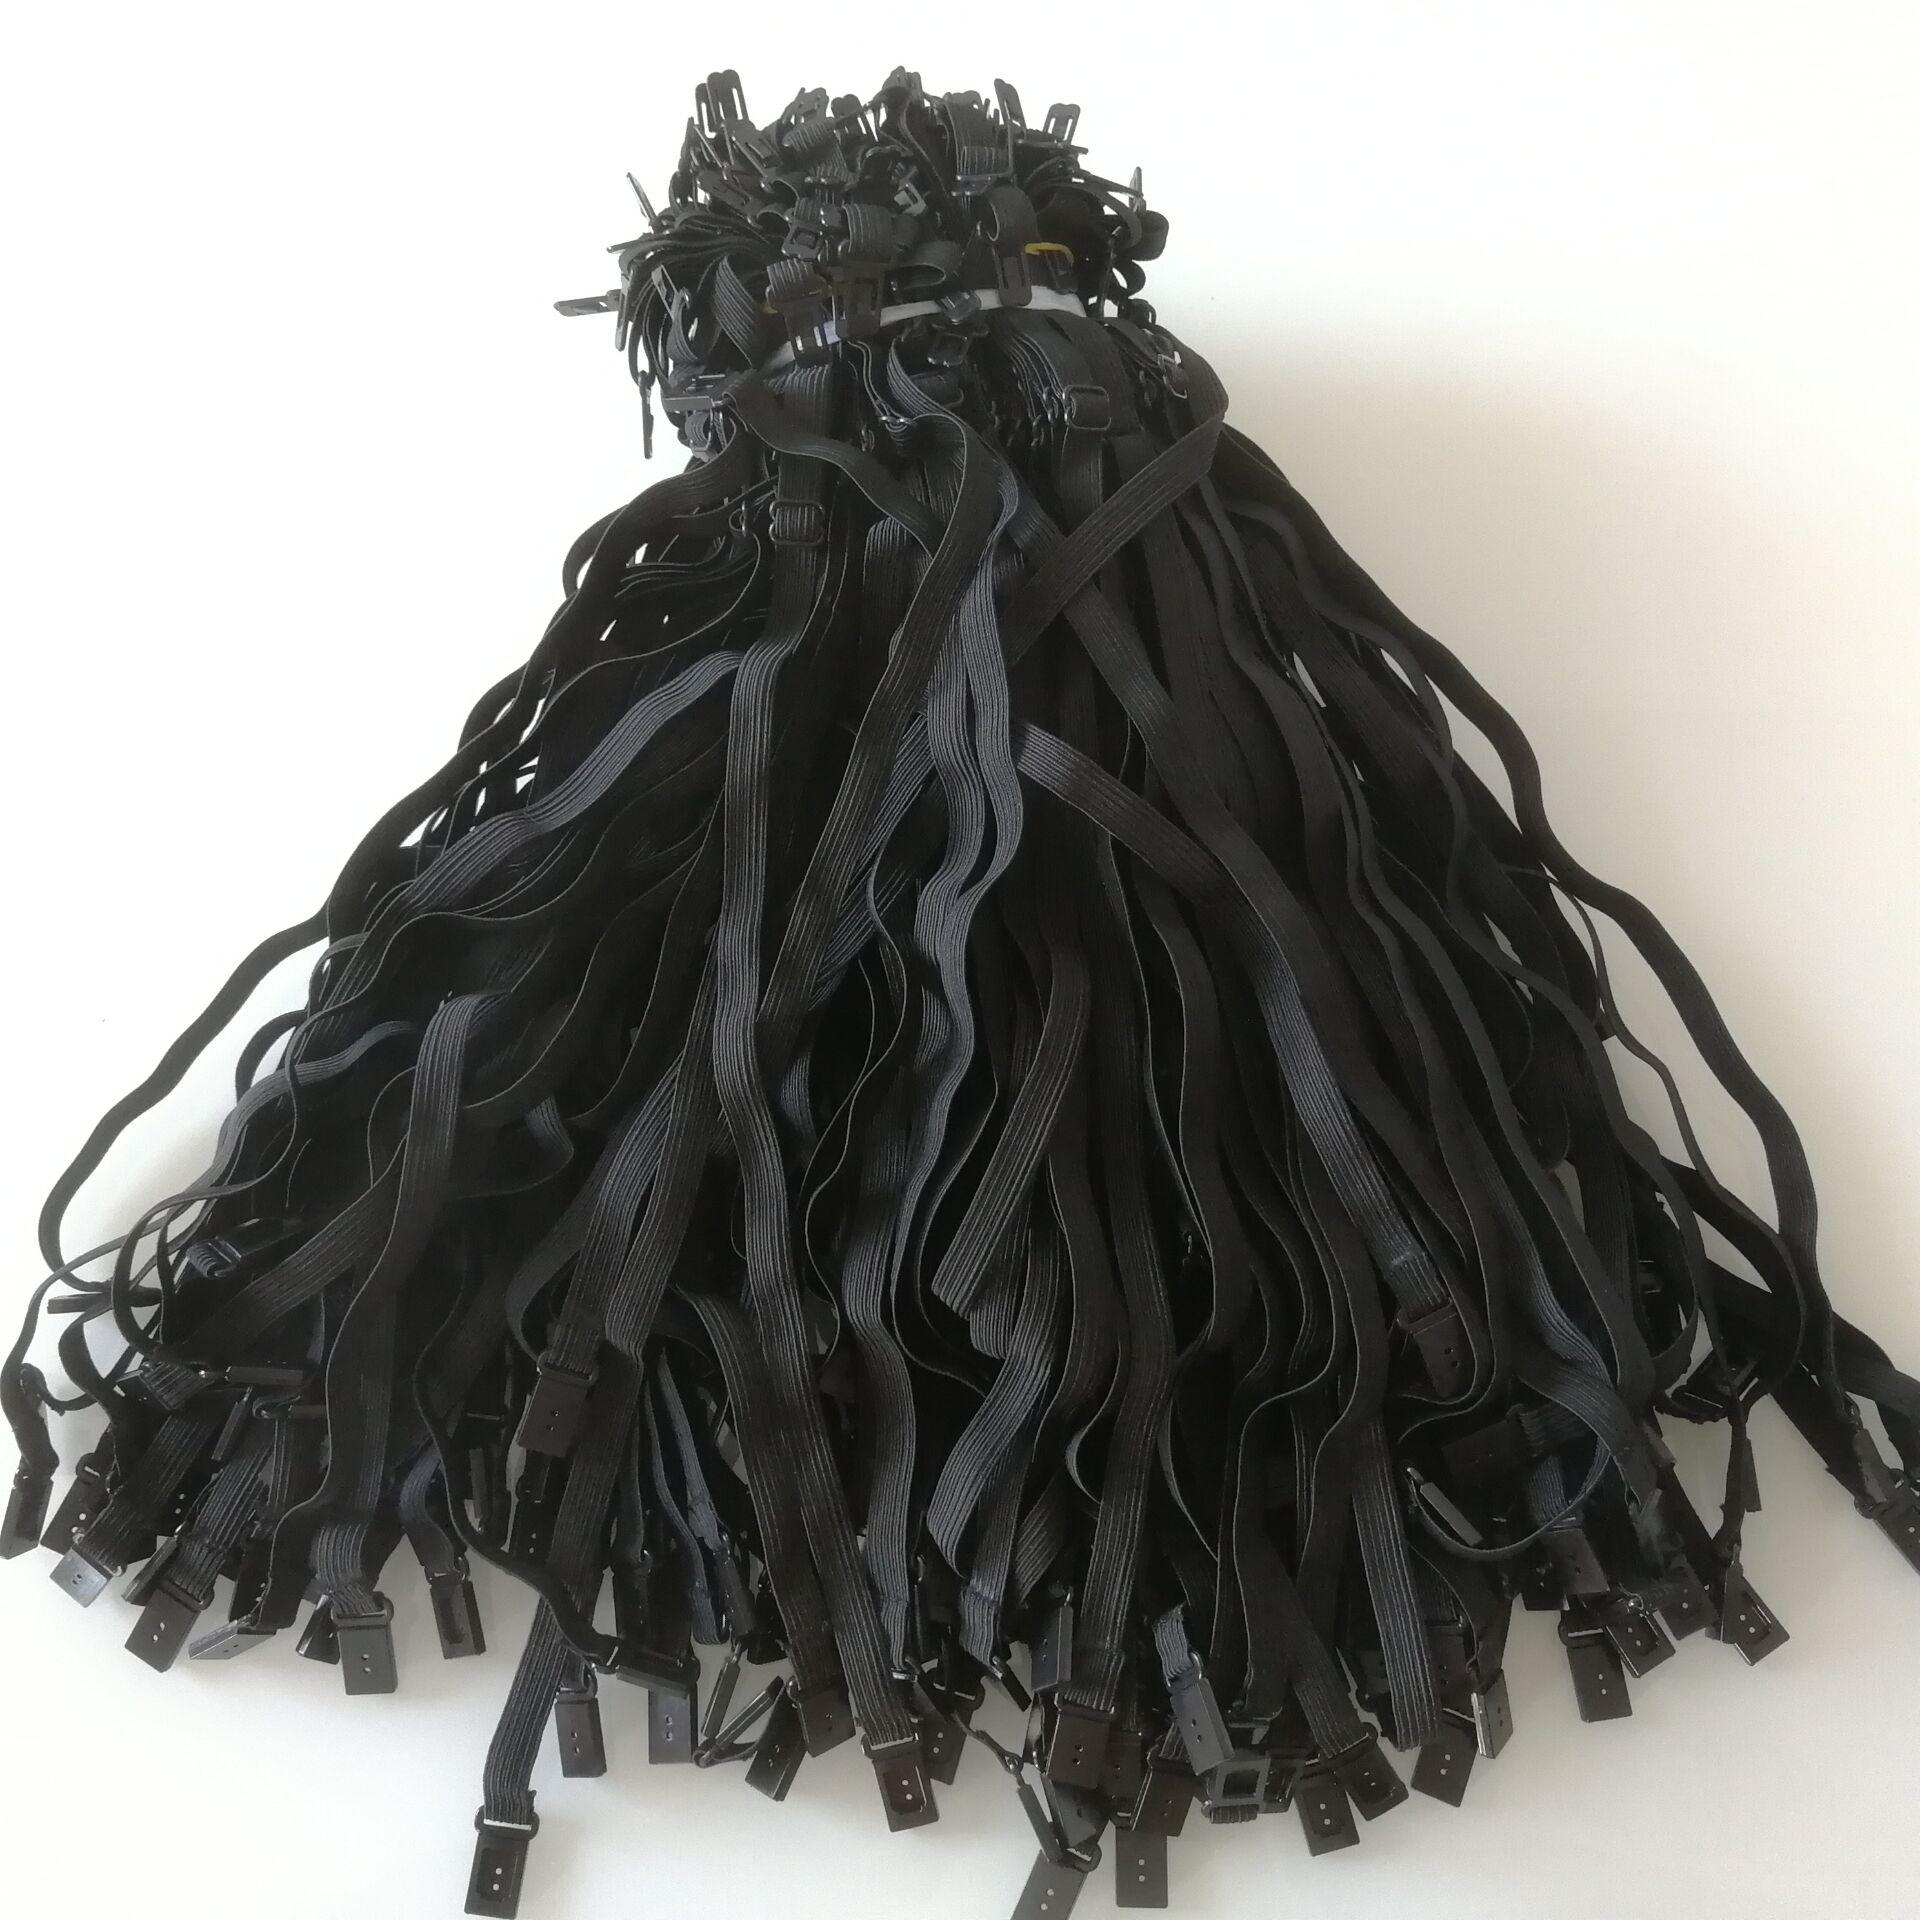 200PCS 2020 DIY 1cm Bow Tie Accessory For Adult Child Men Women Wedding Necktie Adjustment Rope Maximum Length 50cm Elastic Band